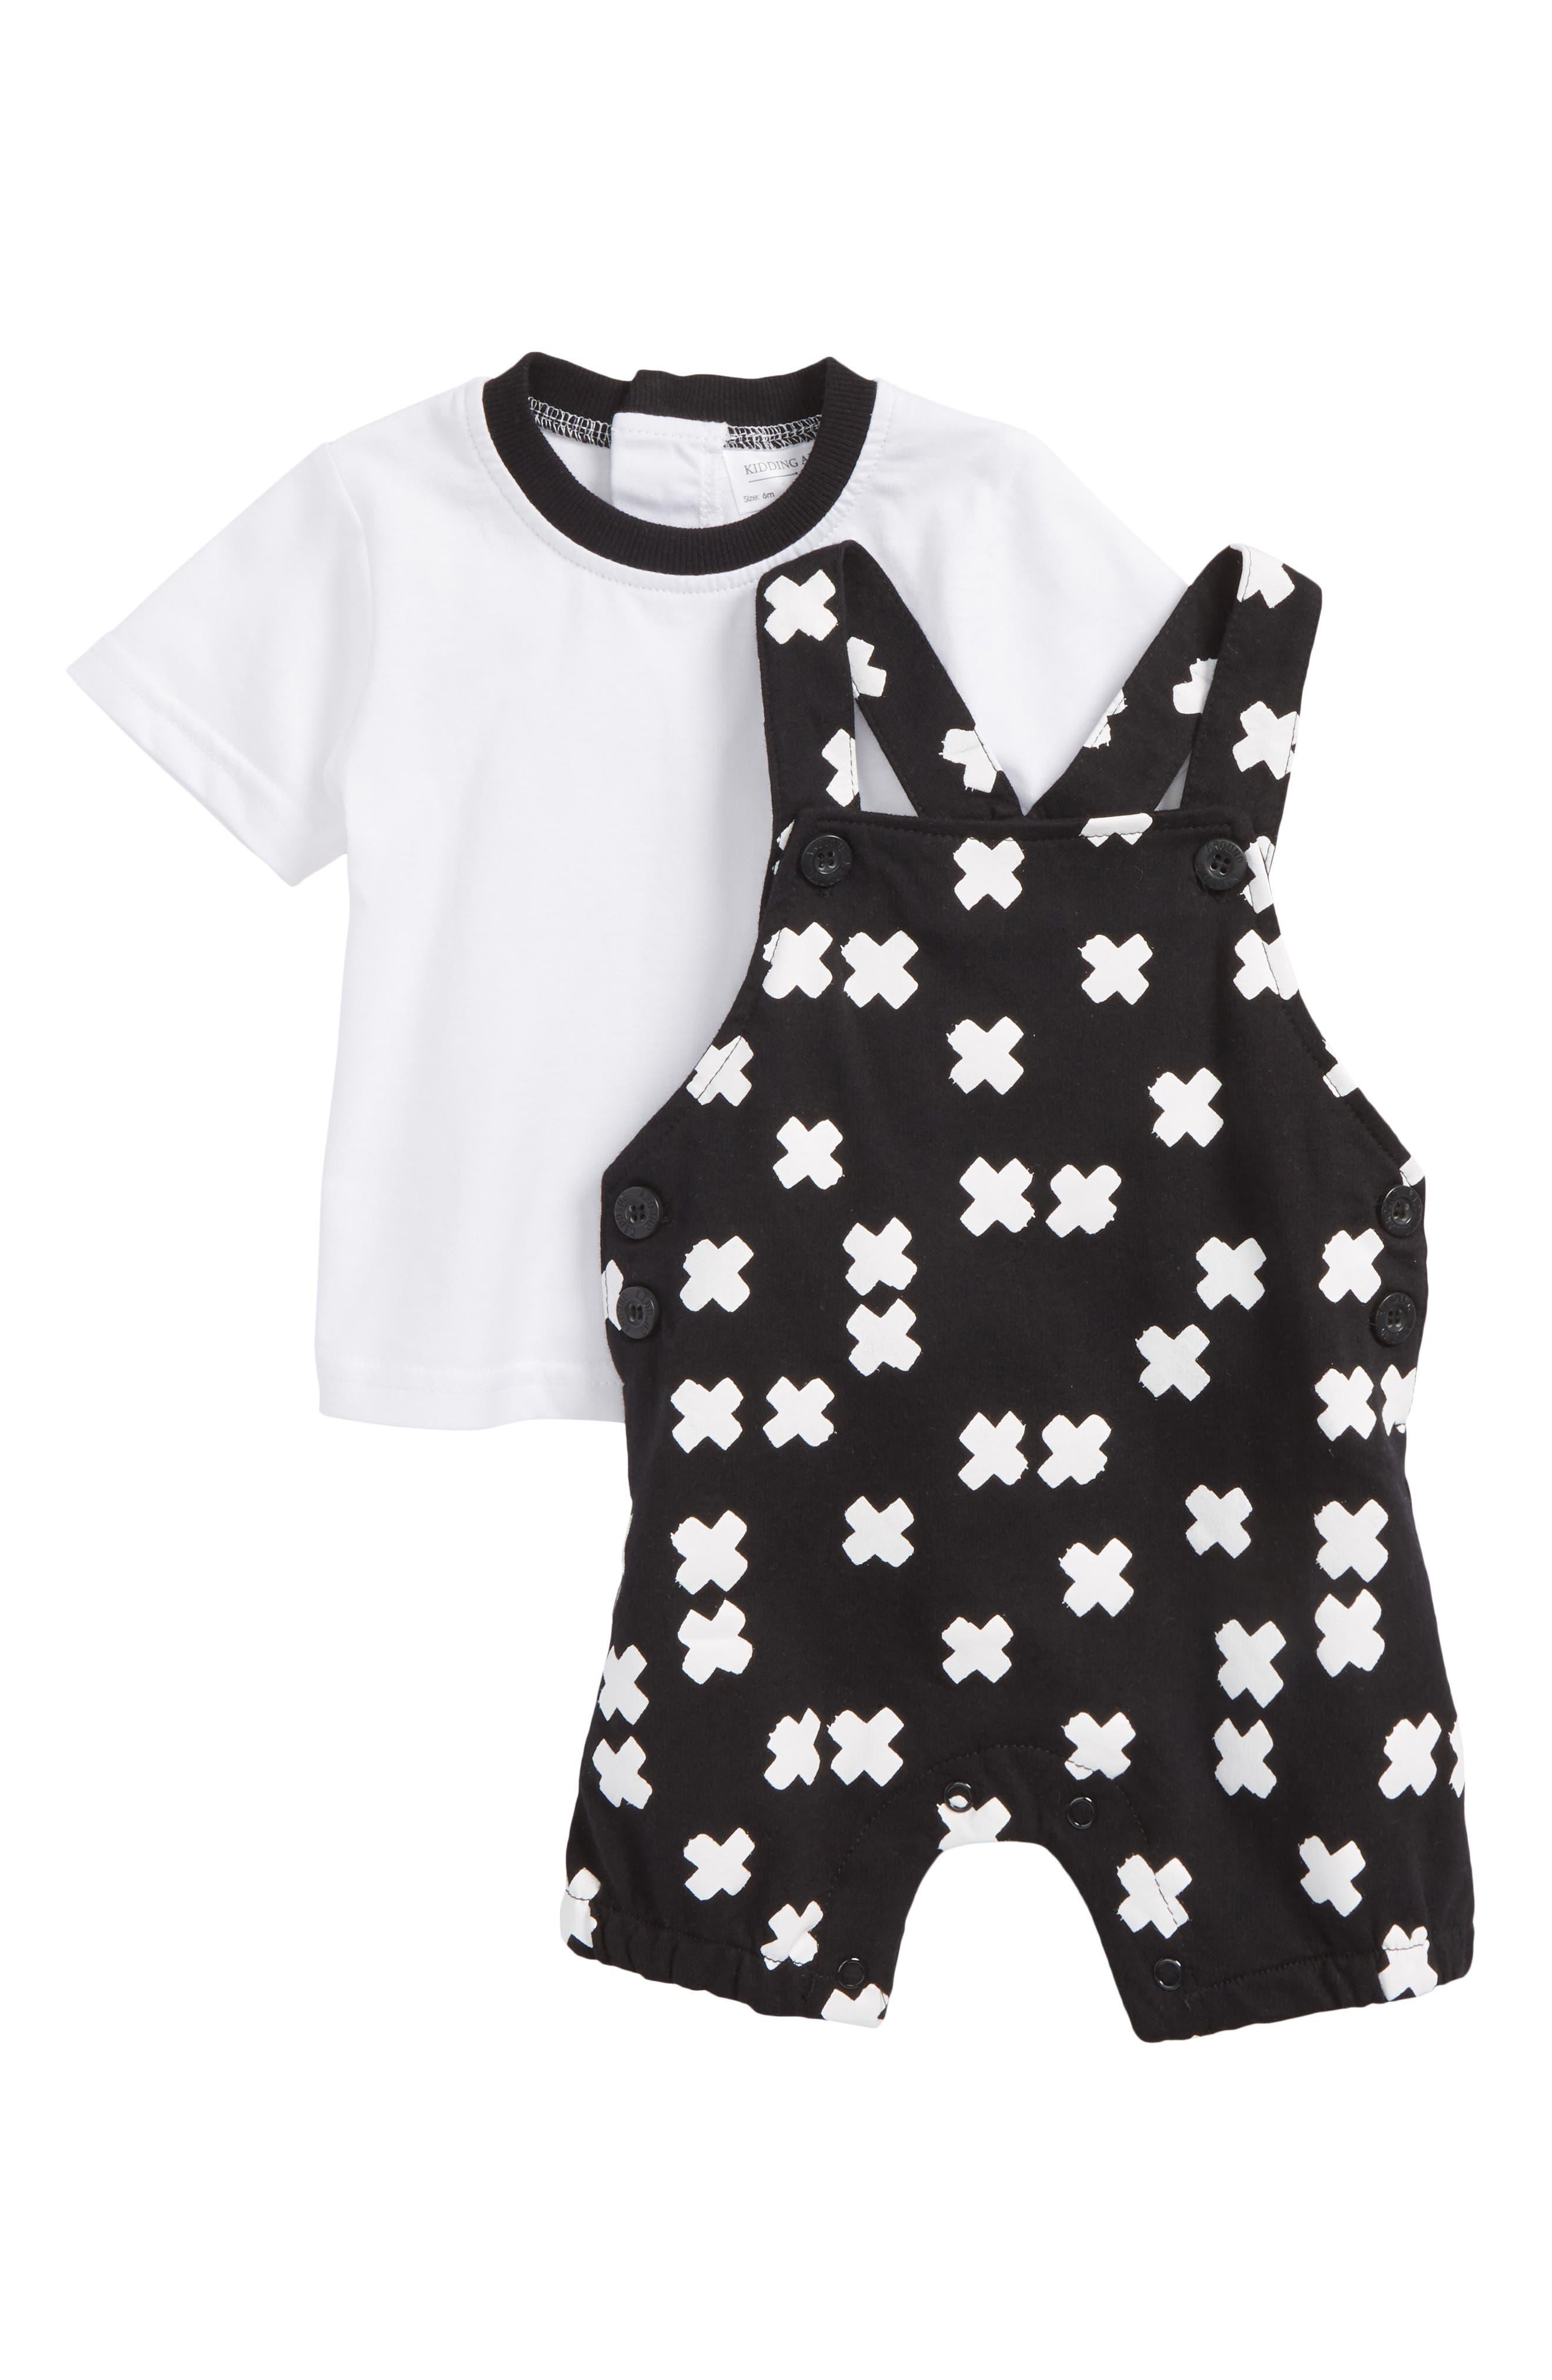 Tee & Short Overalls Set,                         Main,                         color, X White/ Black